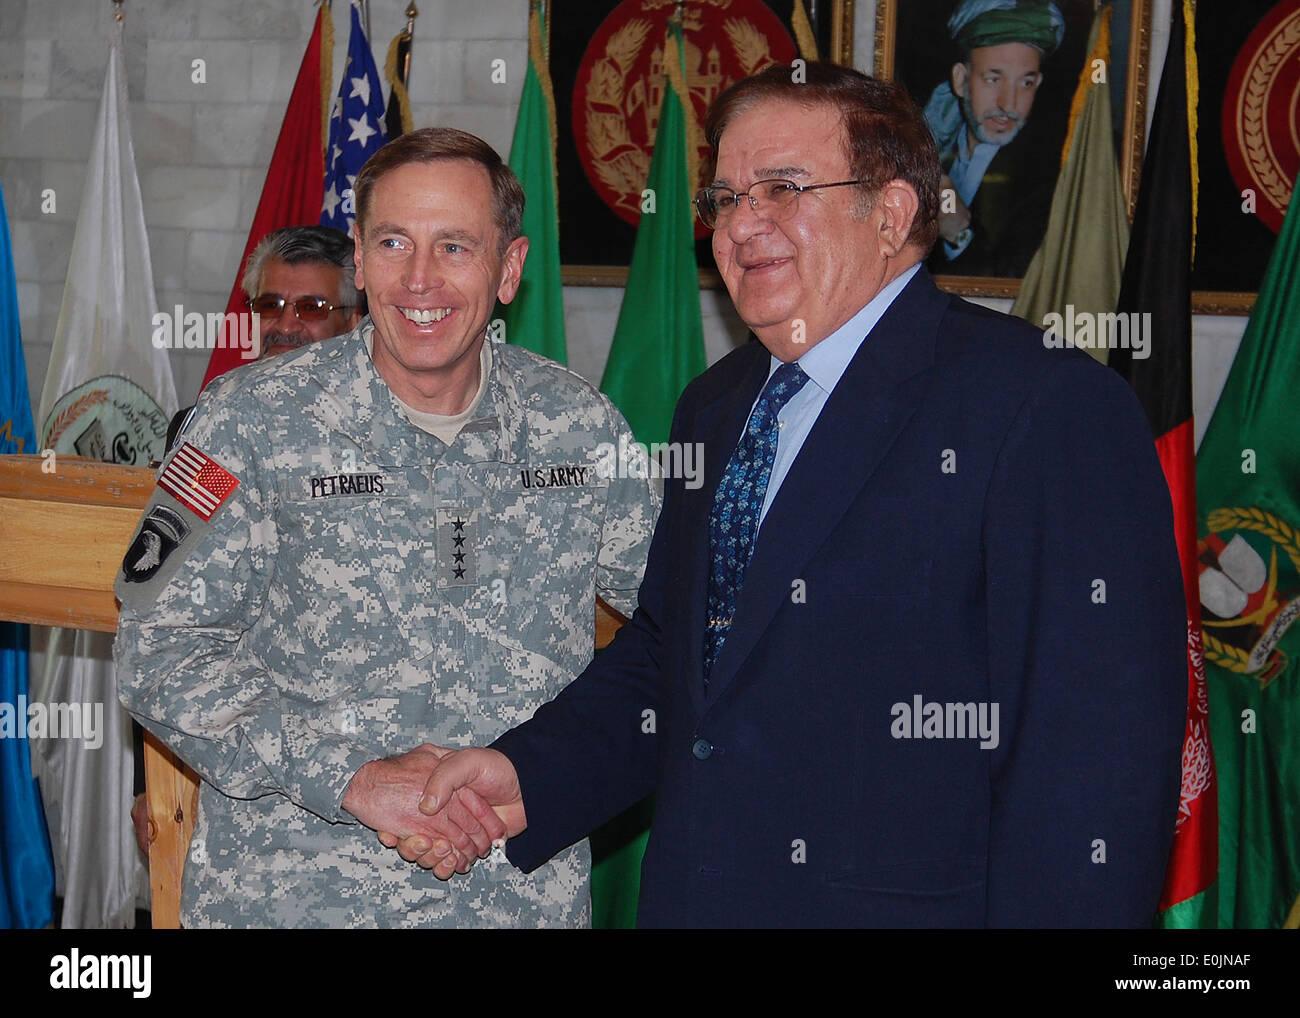 081105-N-7427G-001, KABUL, Afghanistan (Nov. 05, 2008) General David Petraeus, commanding general for U.S. Central Command sh - Stock Image